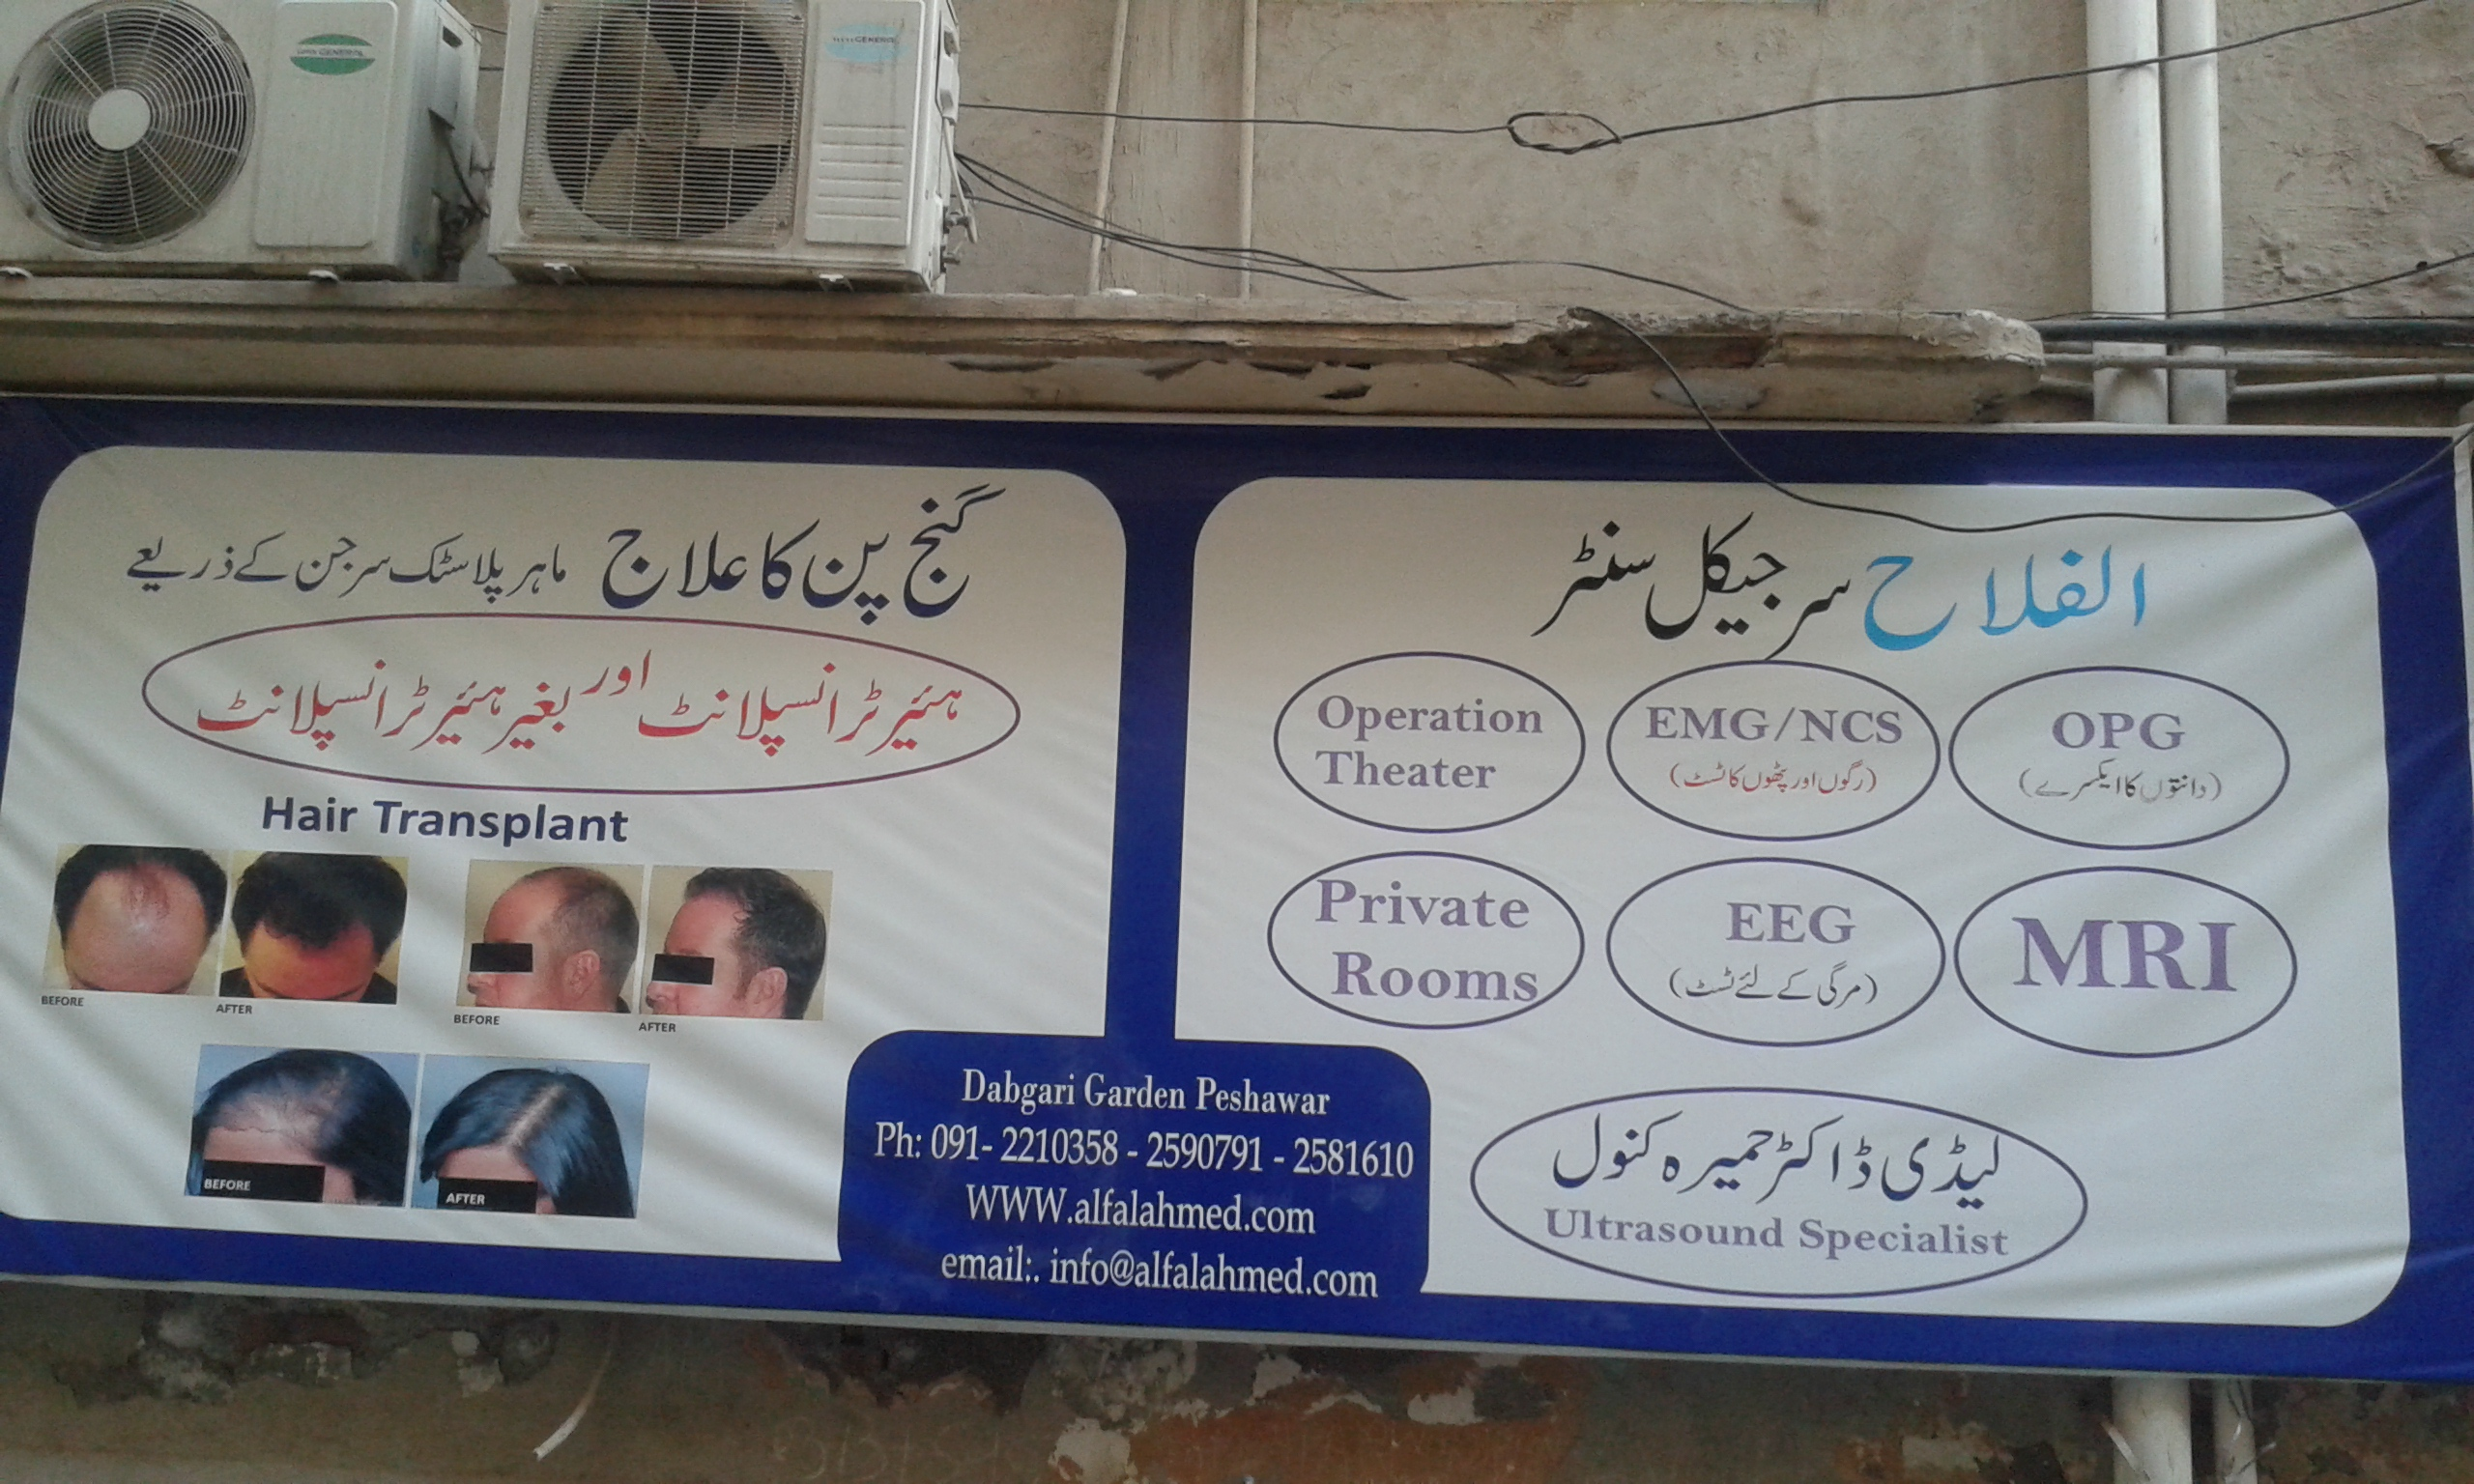 Alfalah Medical Center and Skin Laser Clinic